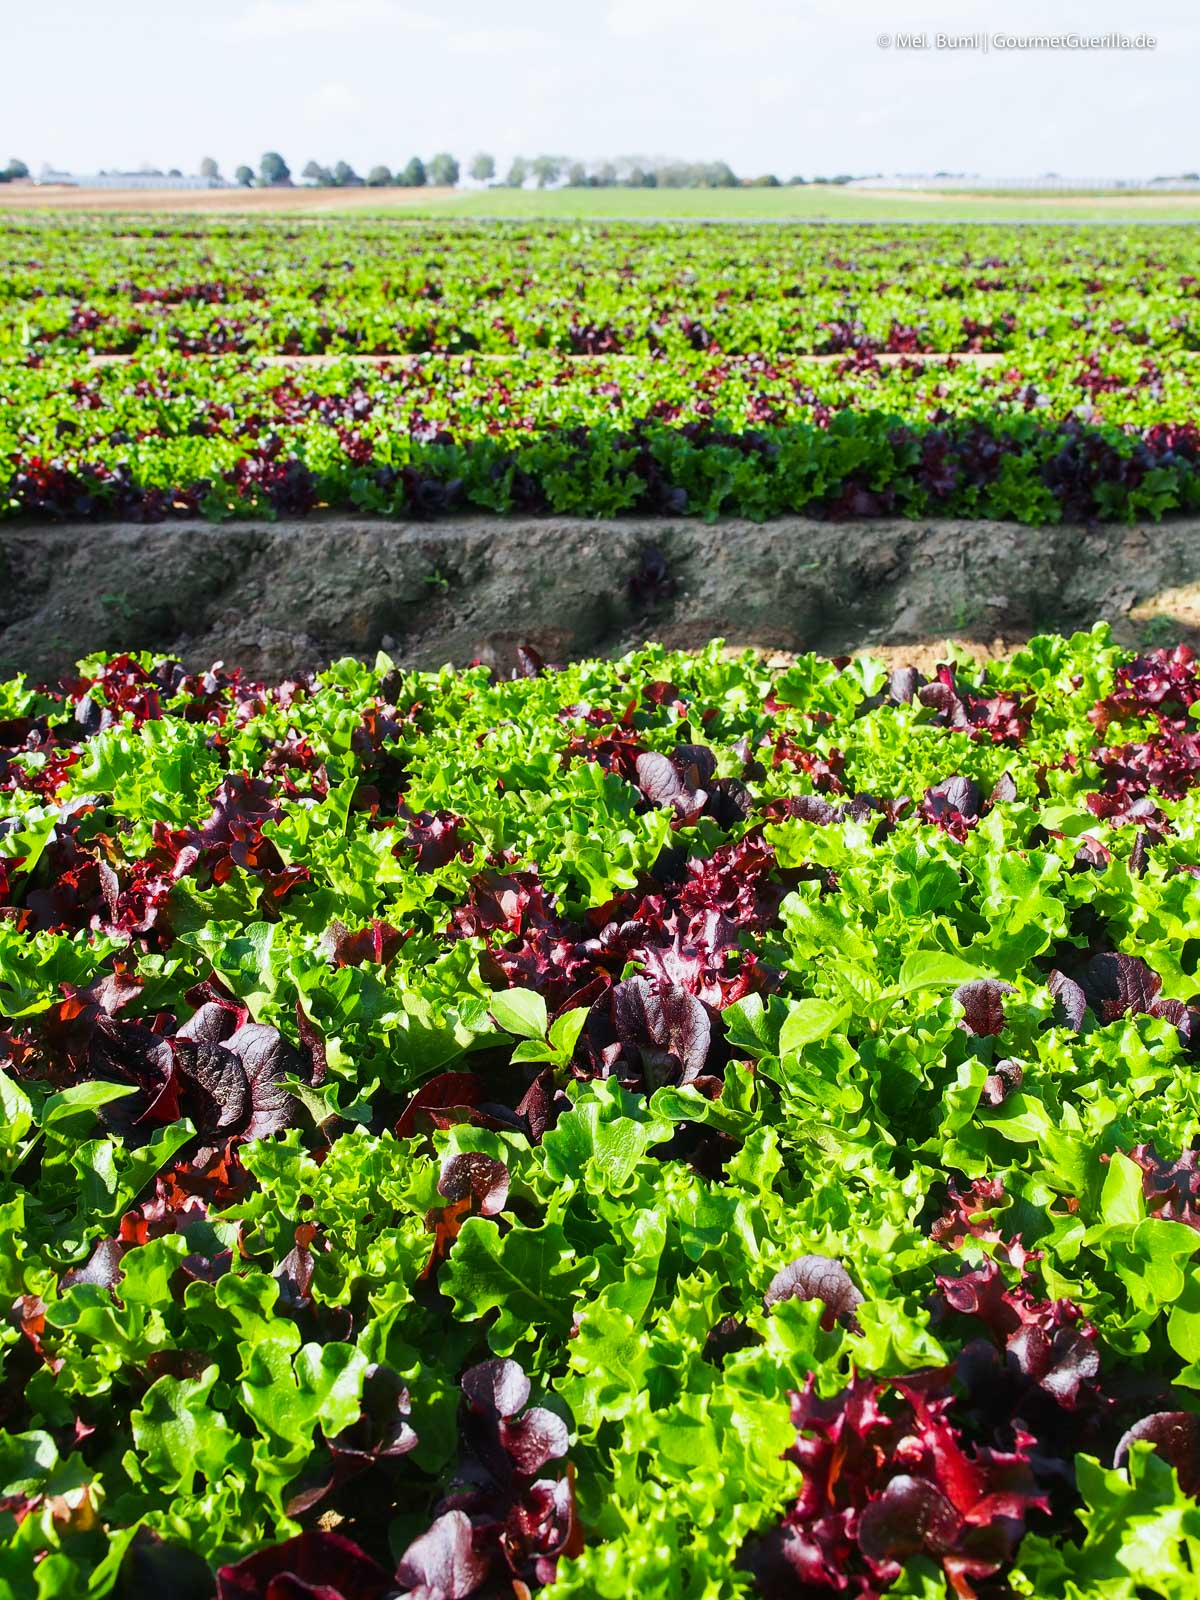 Salatmischung auf dem Feld Eisbergsalat auf dem Feld Bonduelle Academy Salat Anbau und Verarbeitung |GourmetGuerilla.de